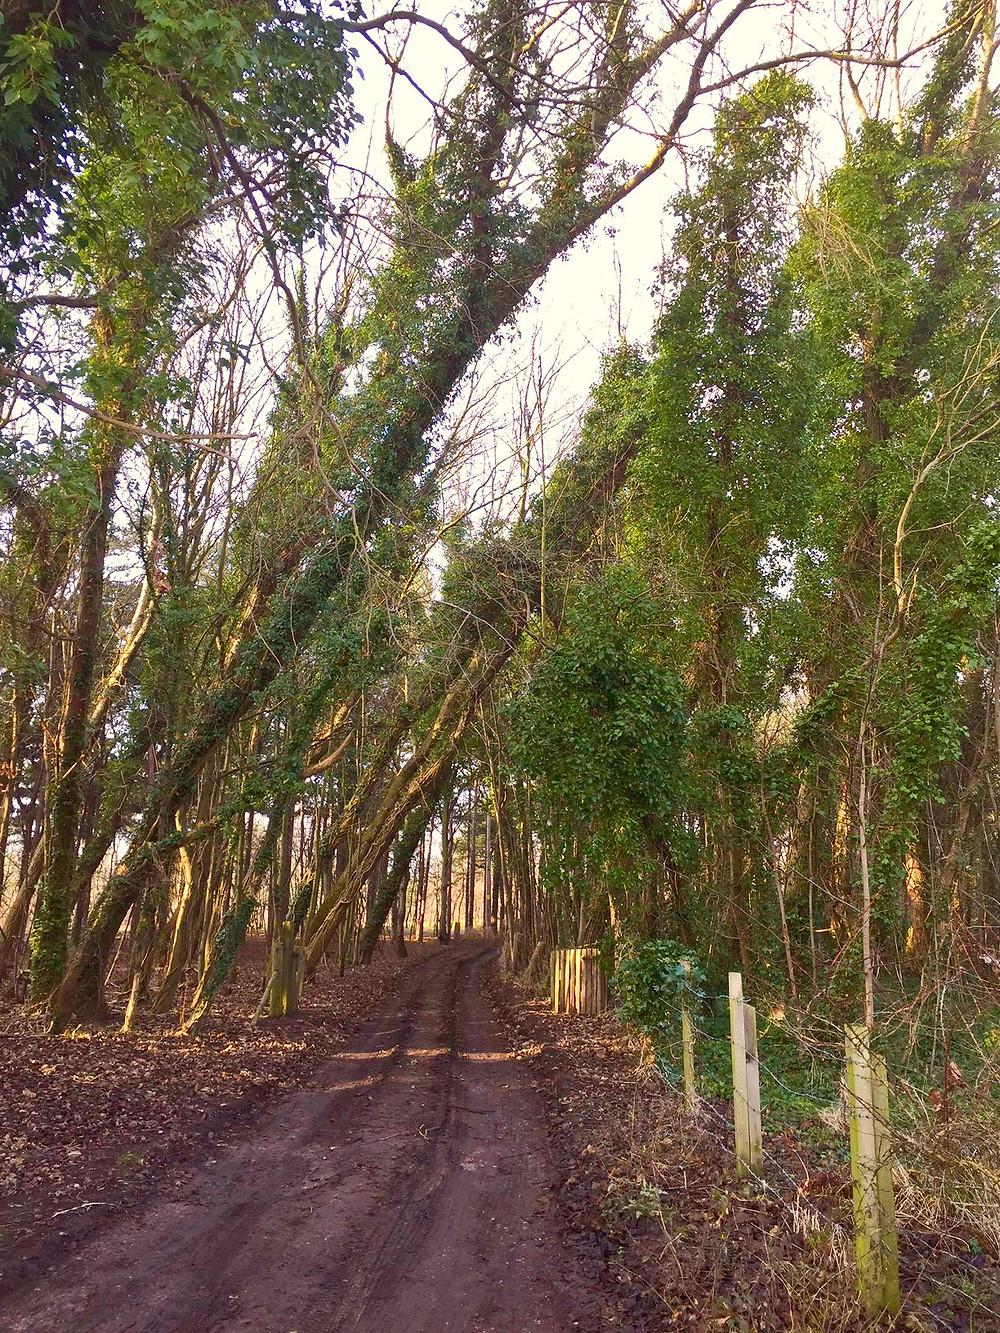 Bent trees3.jpg